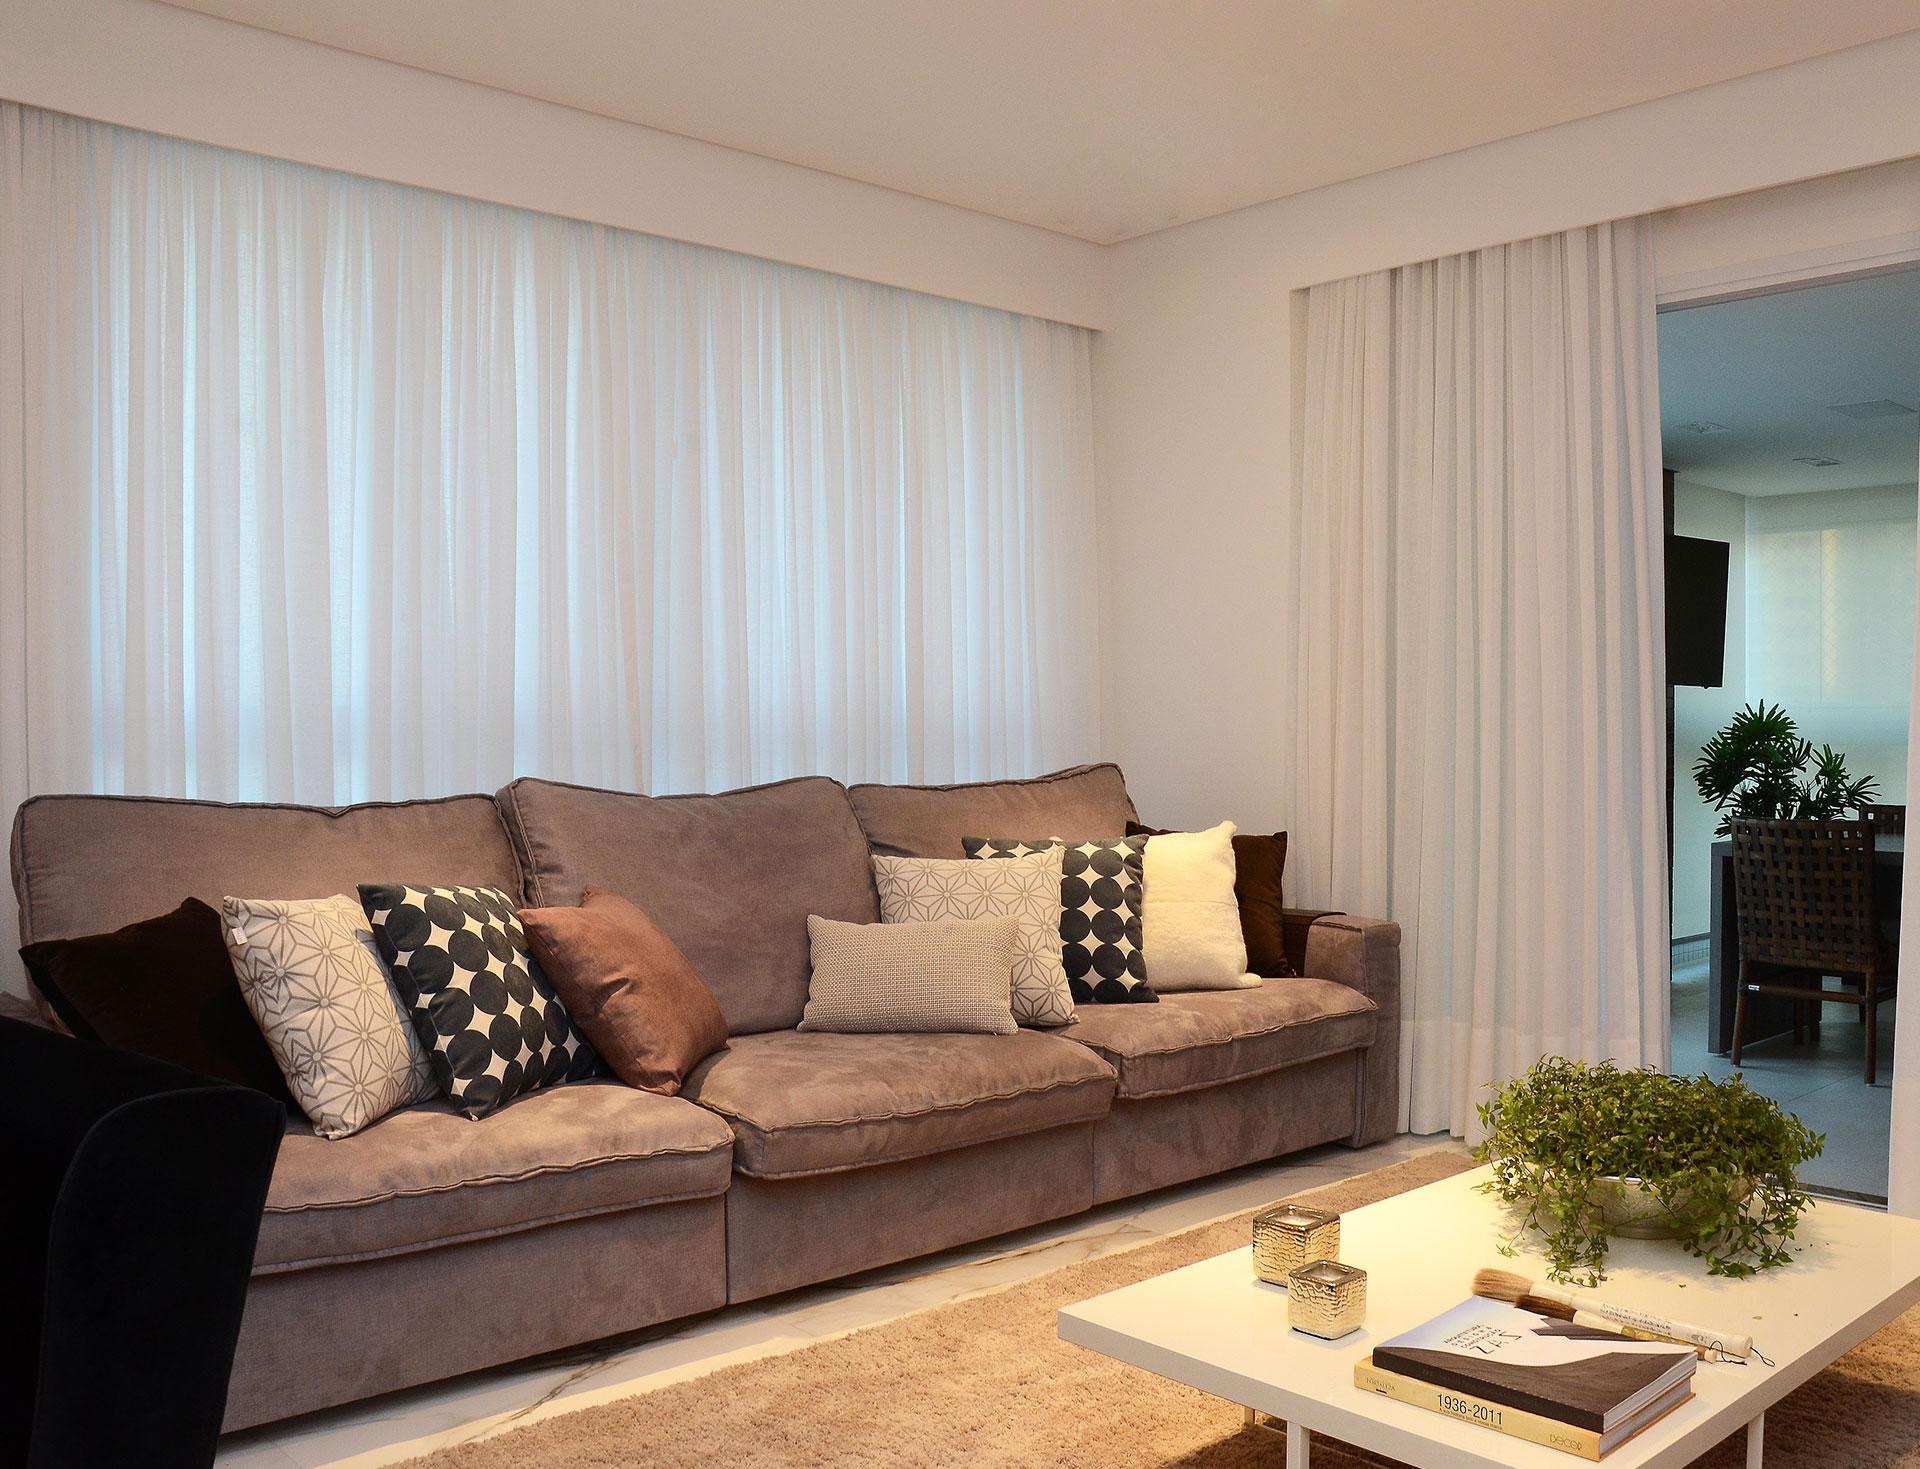 portfolio-cynthia-rolnik-apartamento2-03